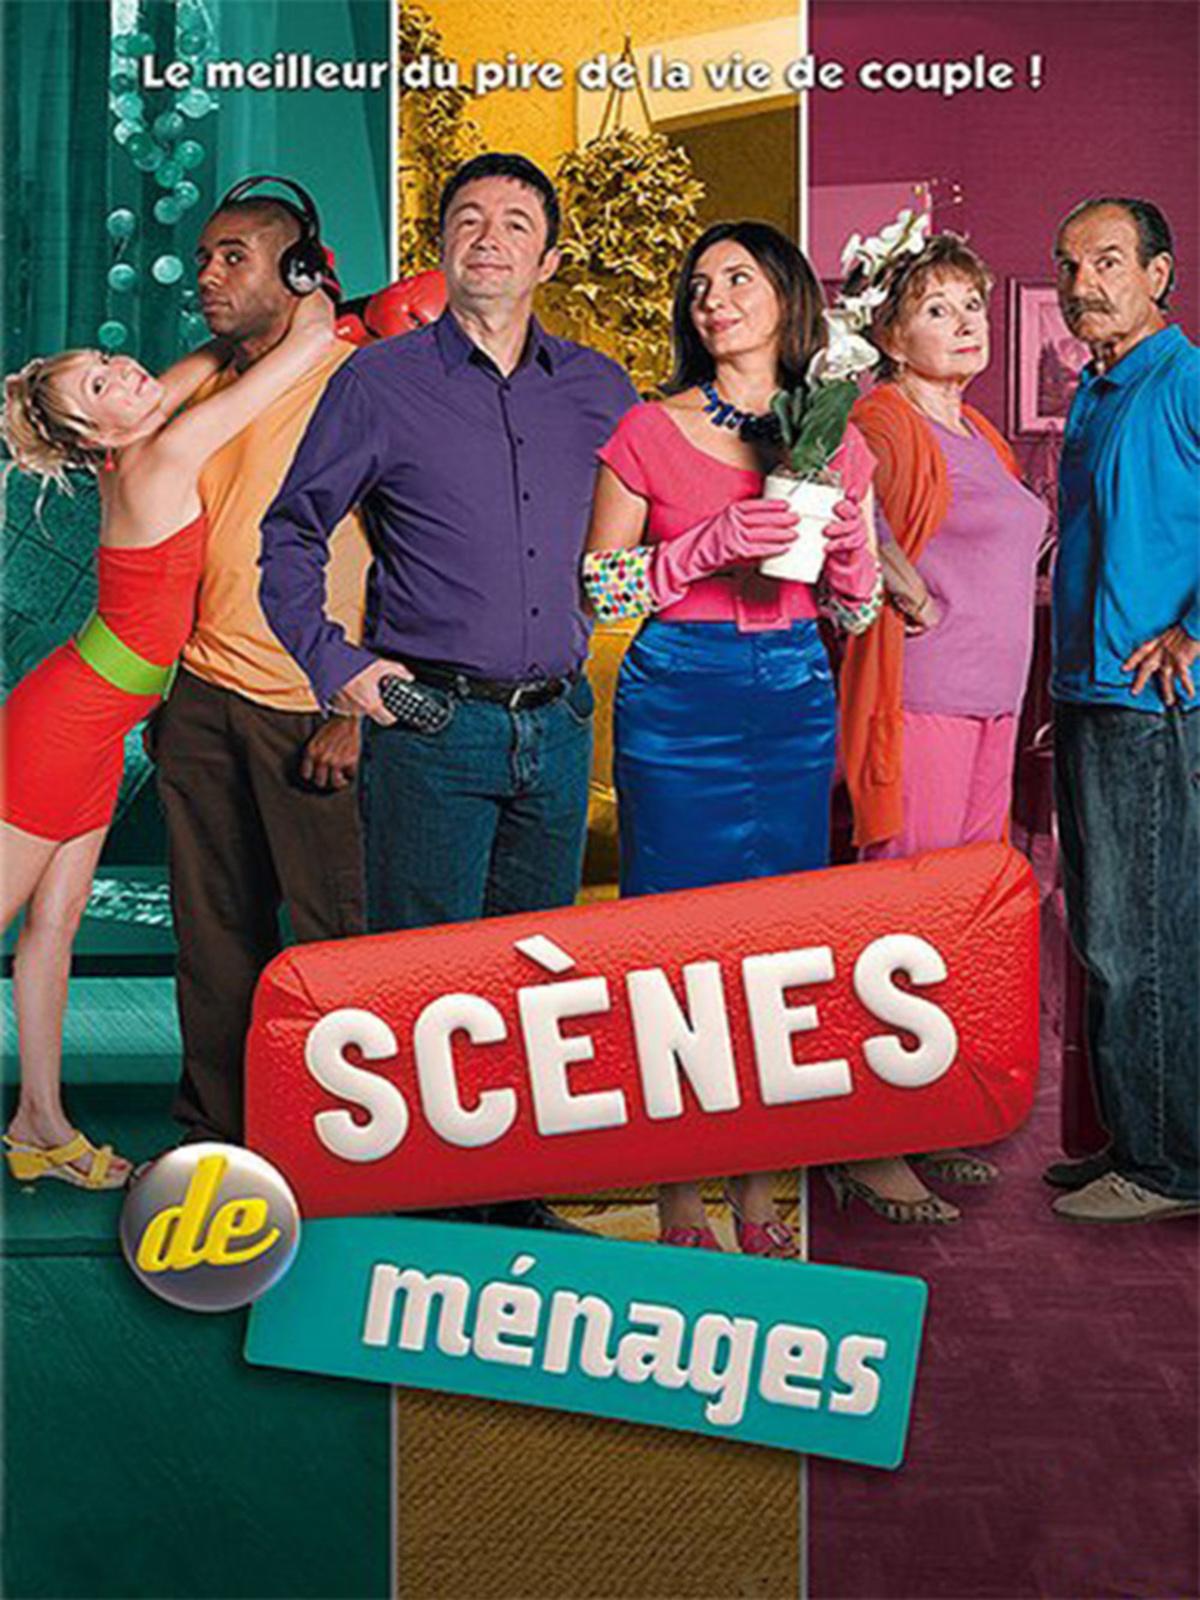 Scenes_de_menages1